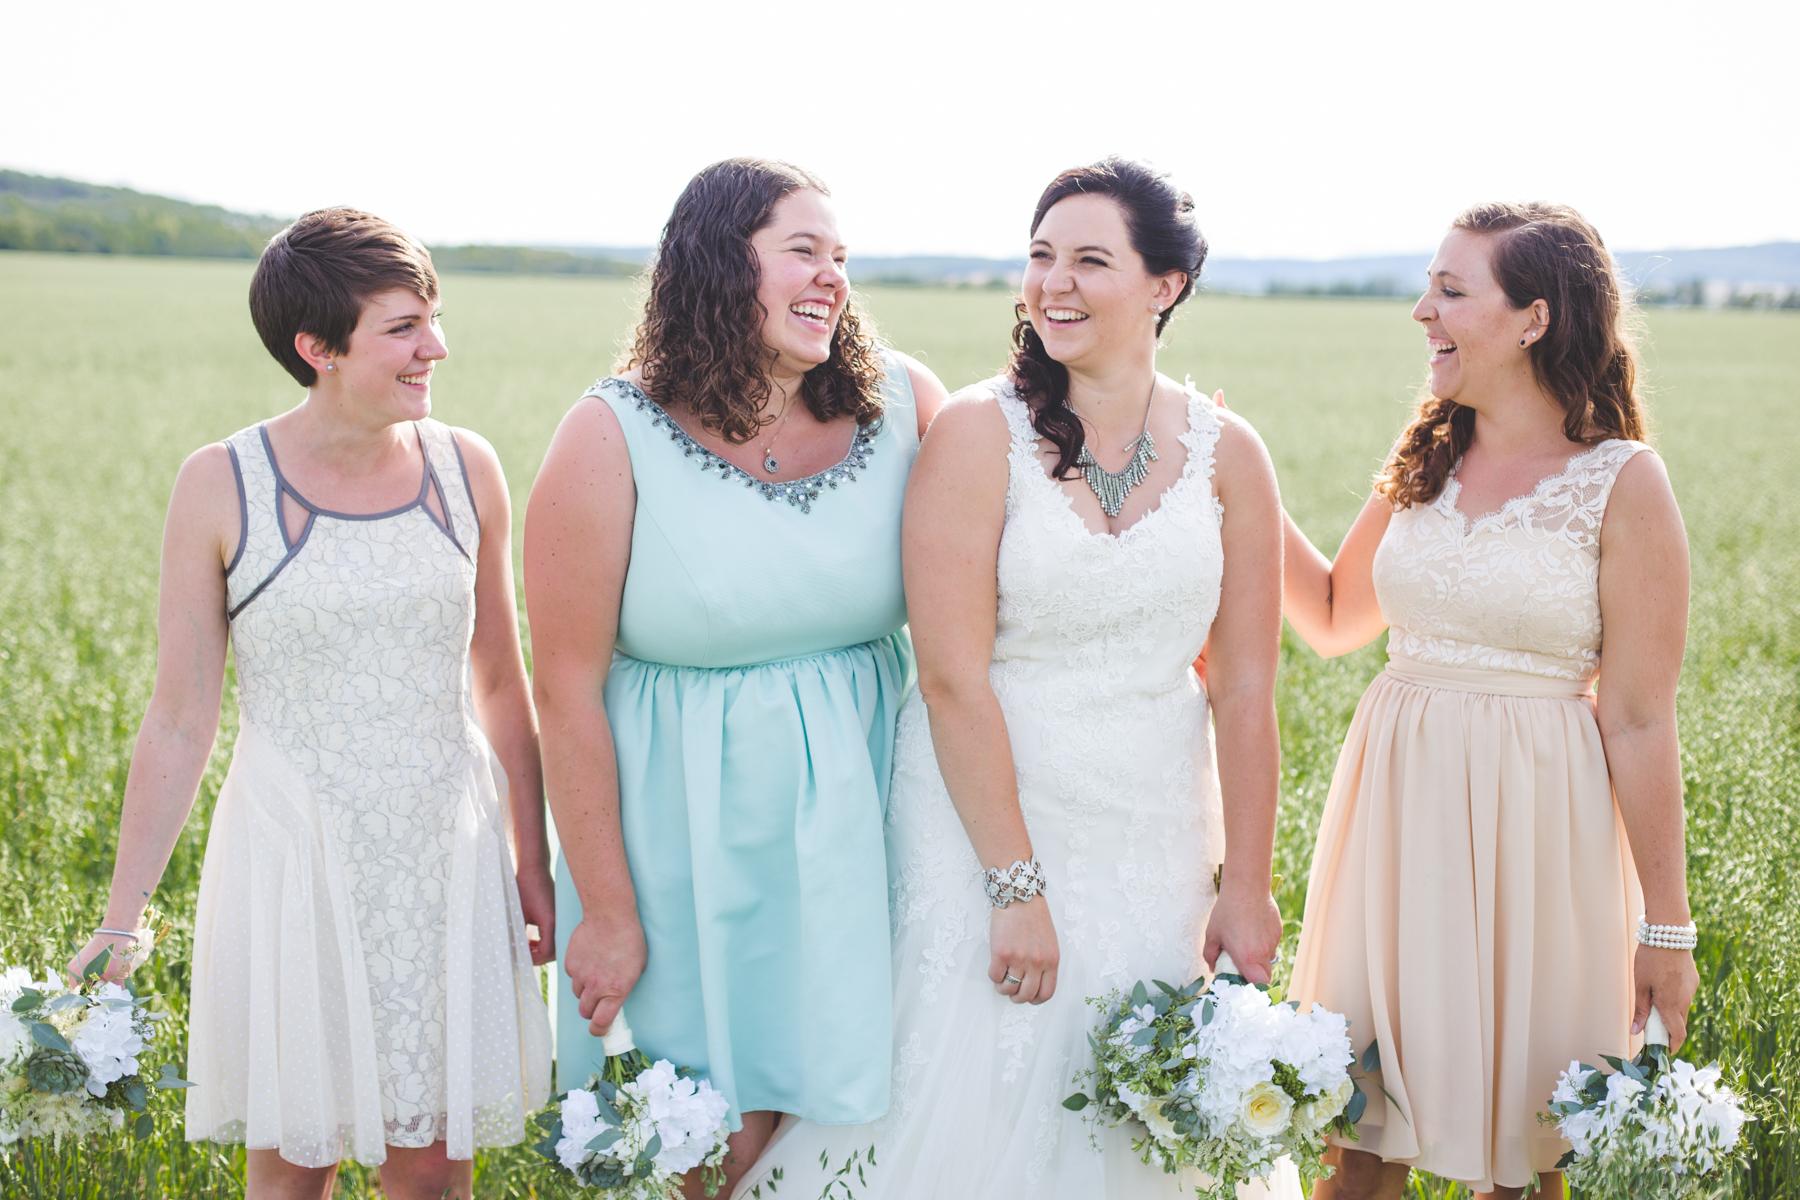 20150808-oglovewedding-41.jpg